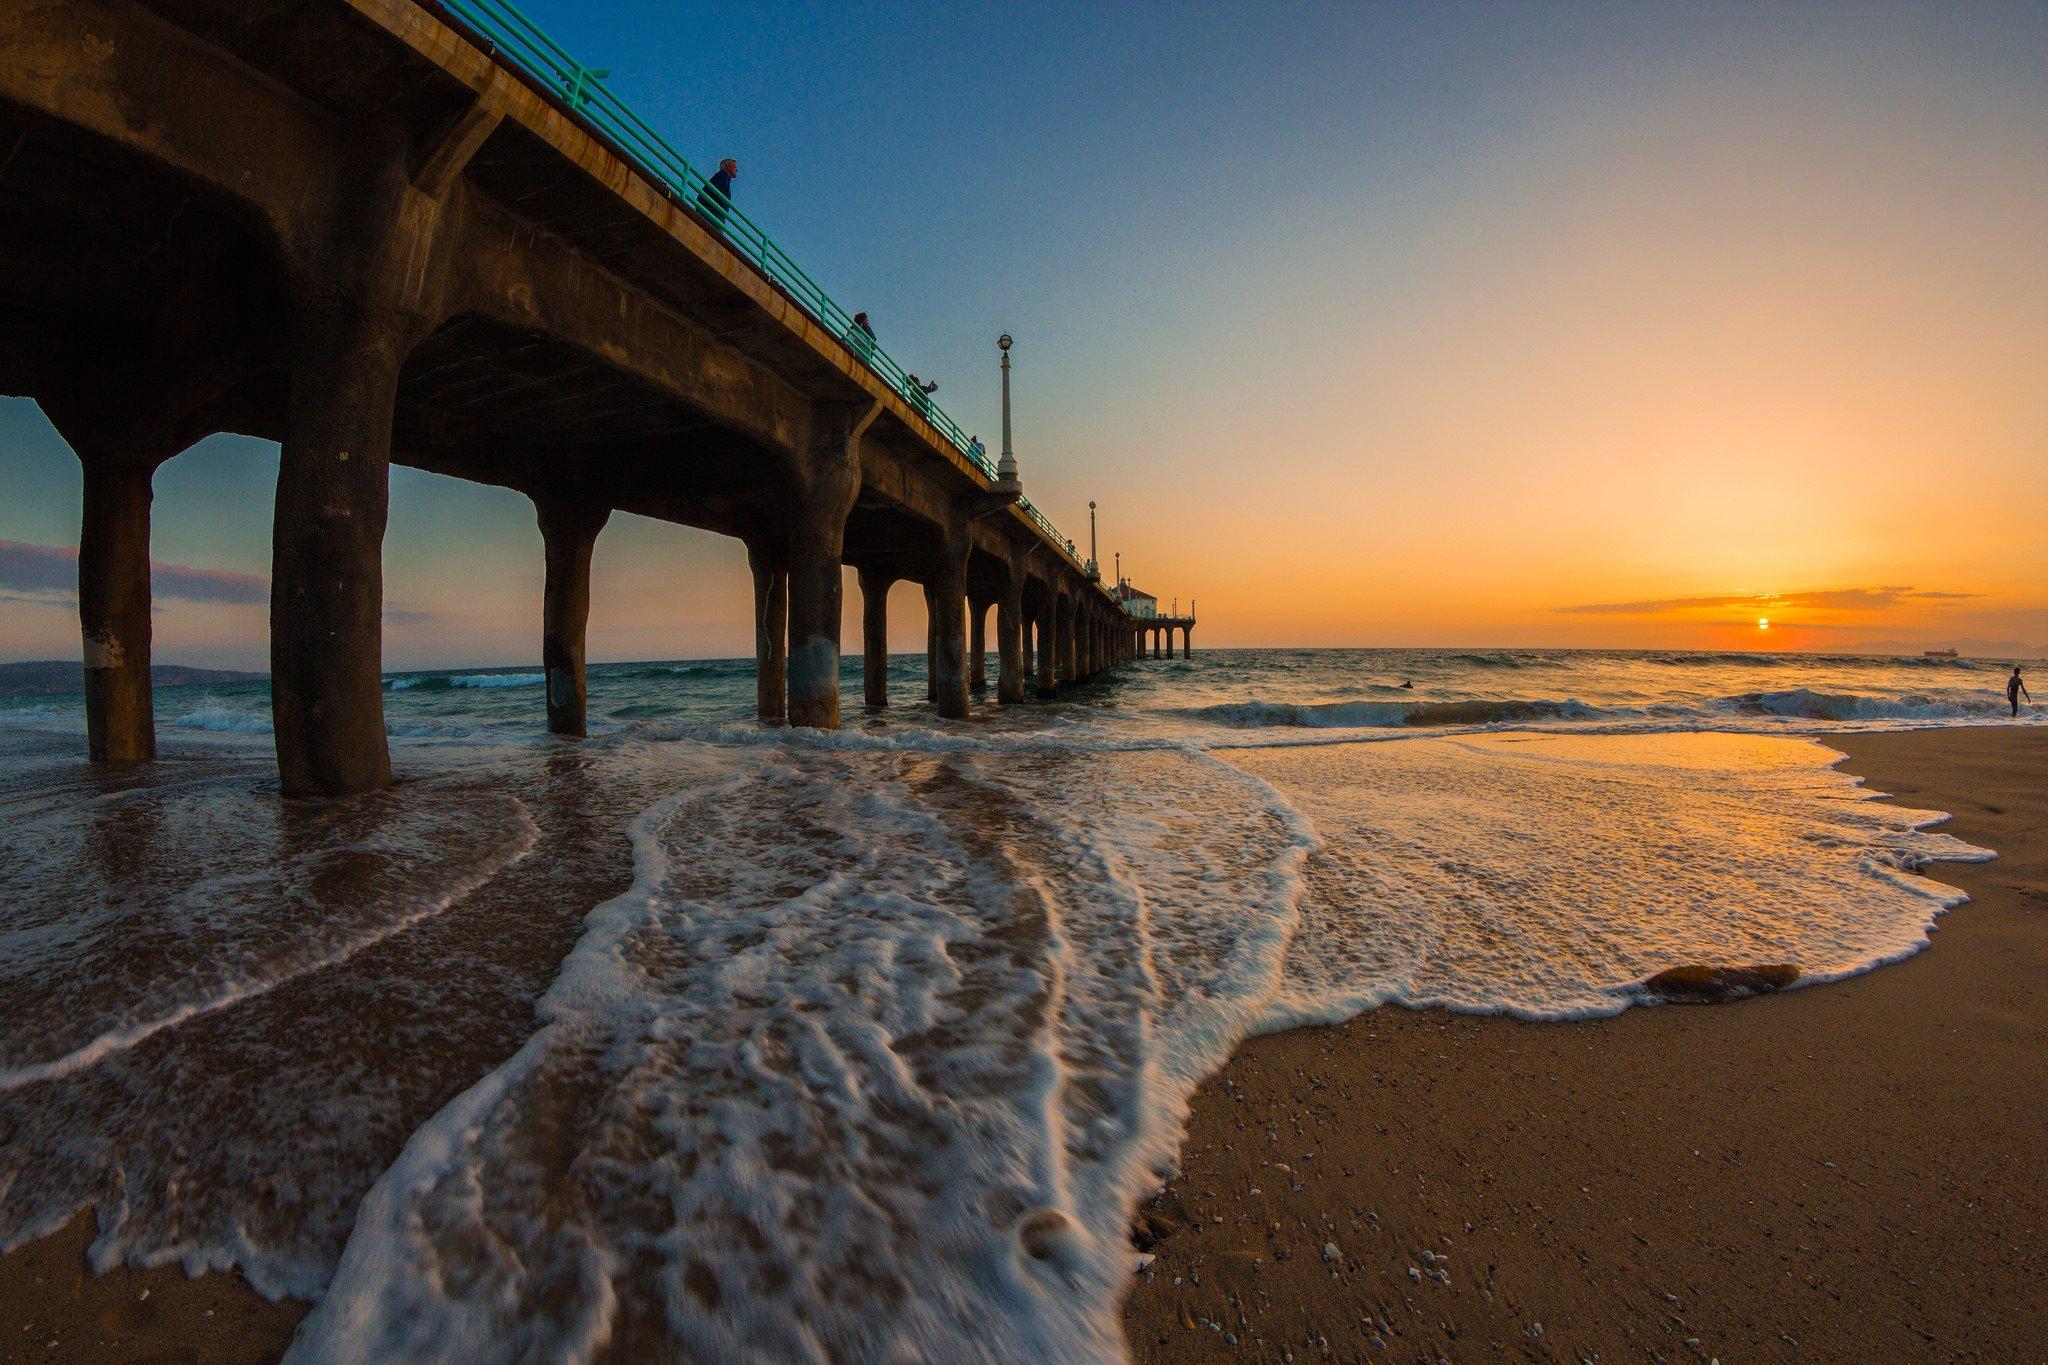 download image venice beach - photo #48